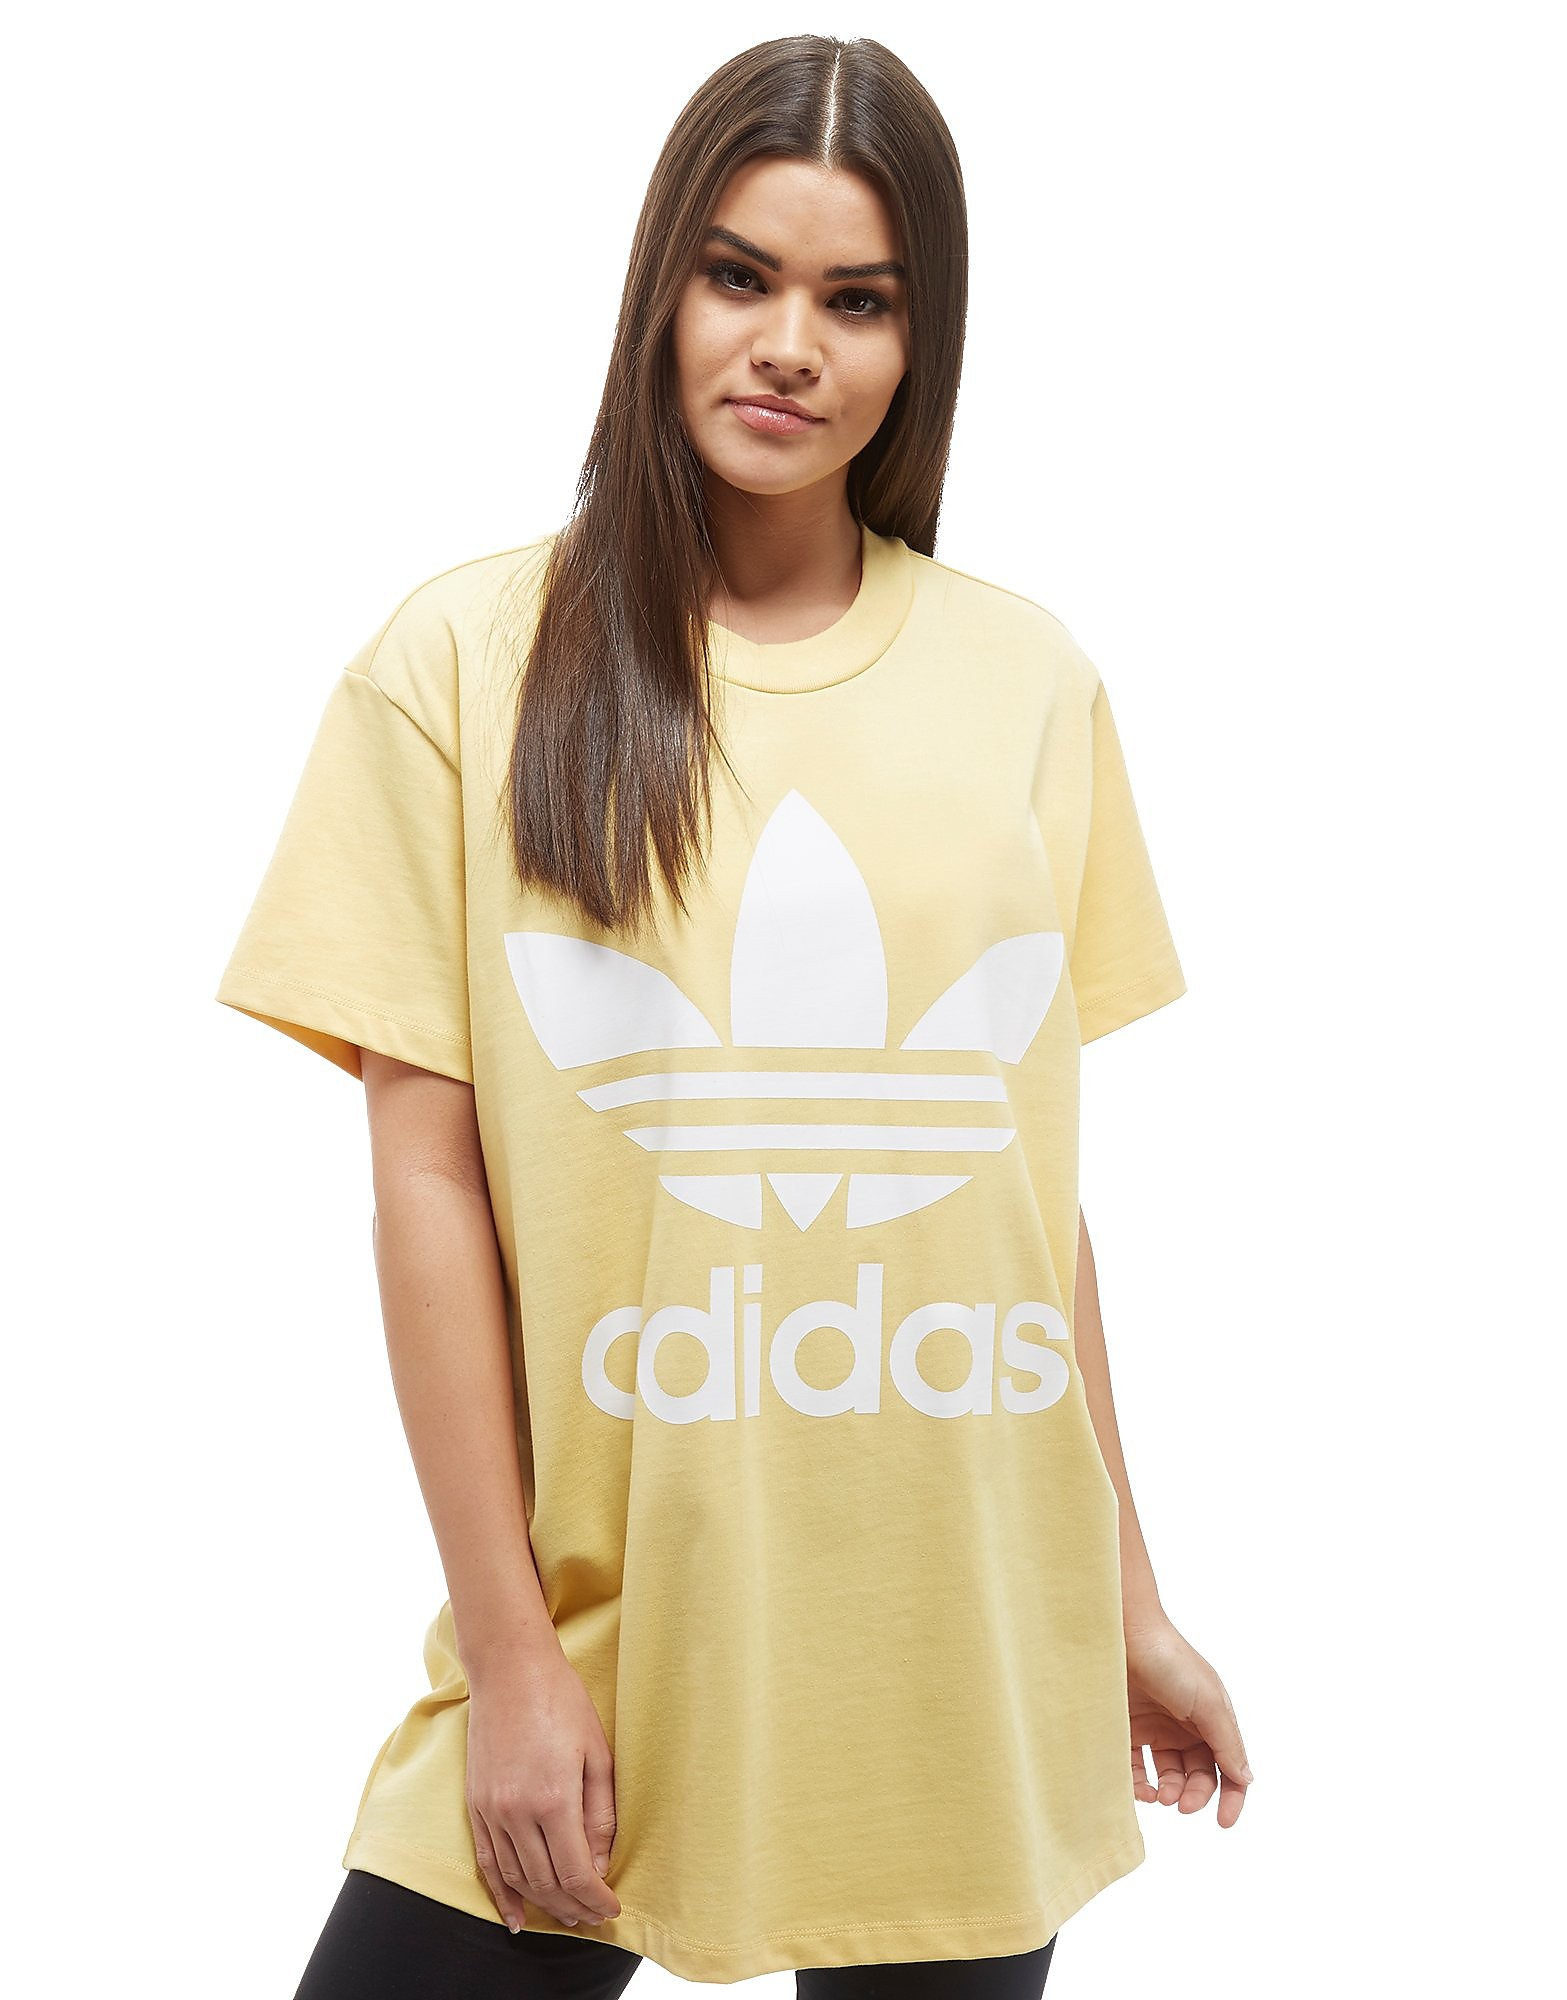 adidas Originals T-shirt Big Trefoil Femme